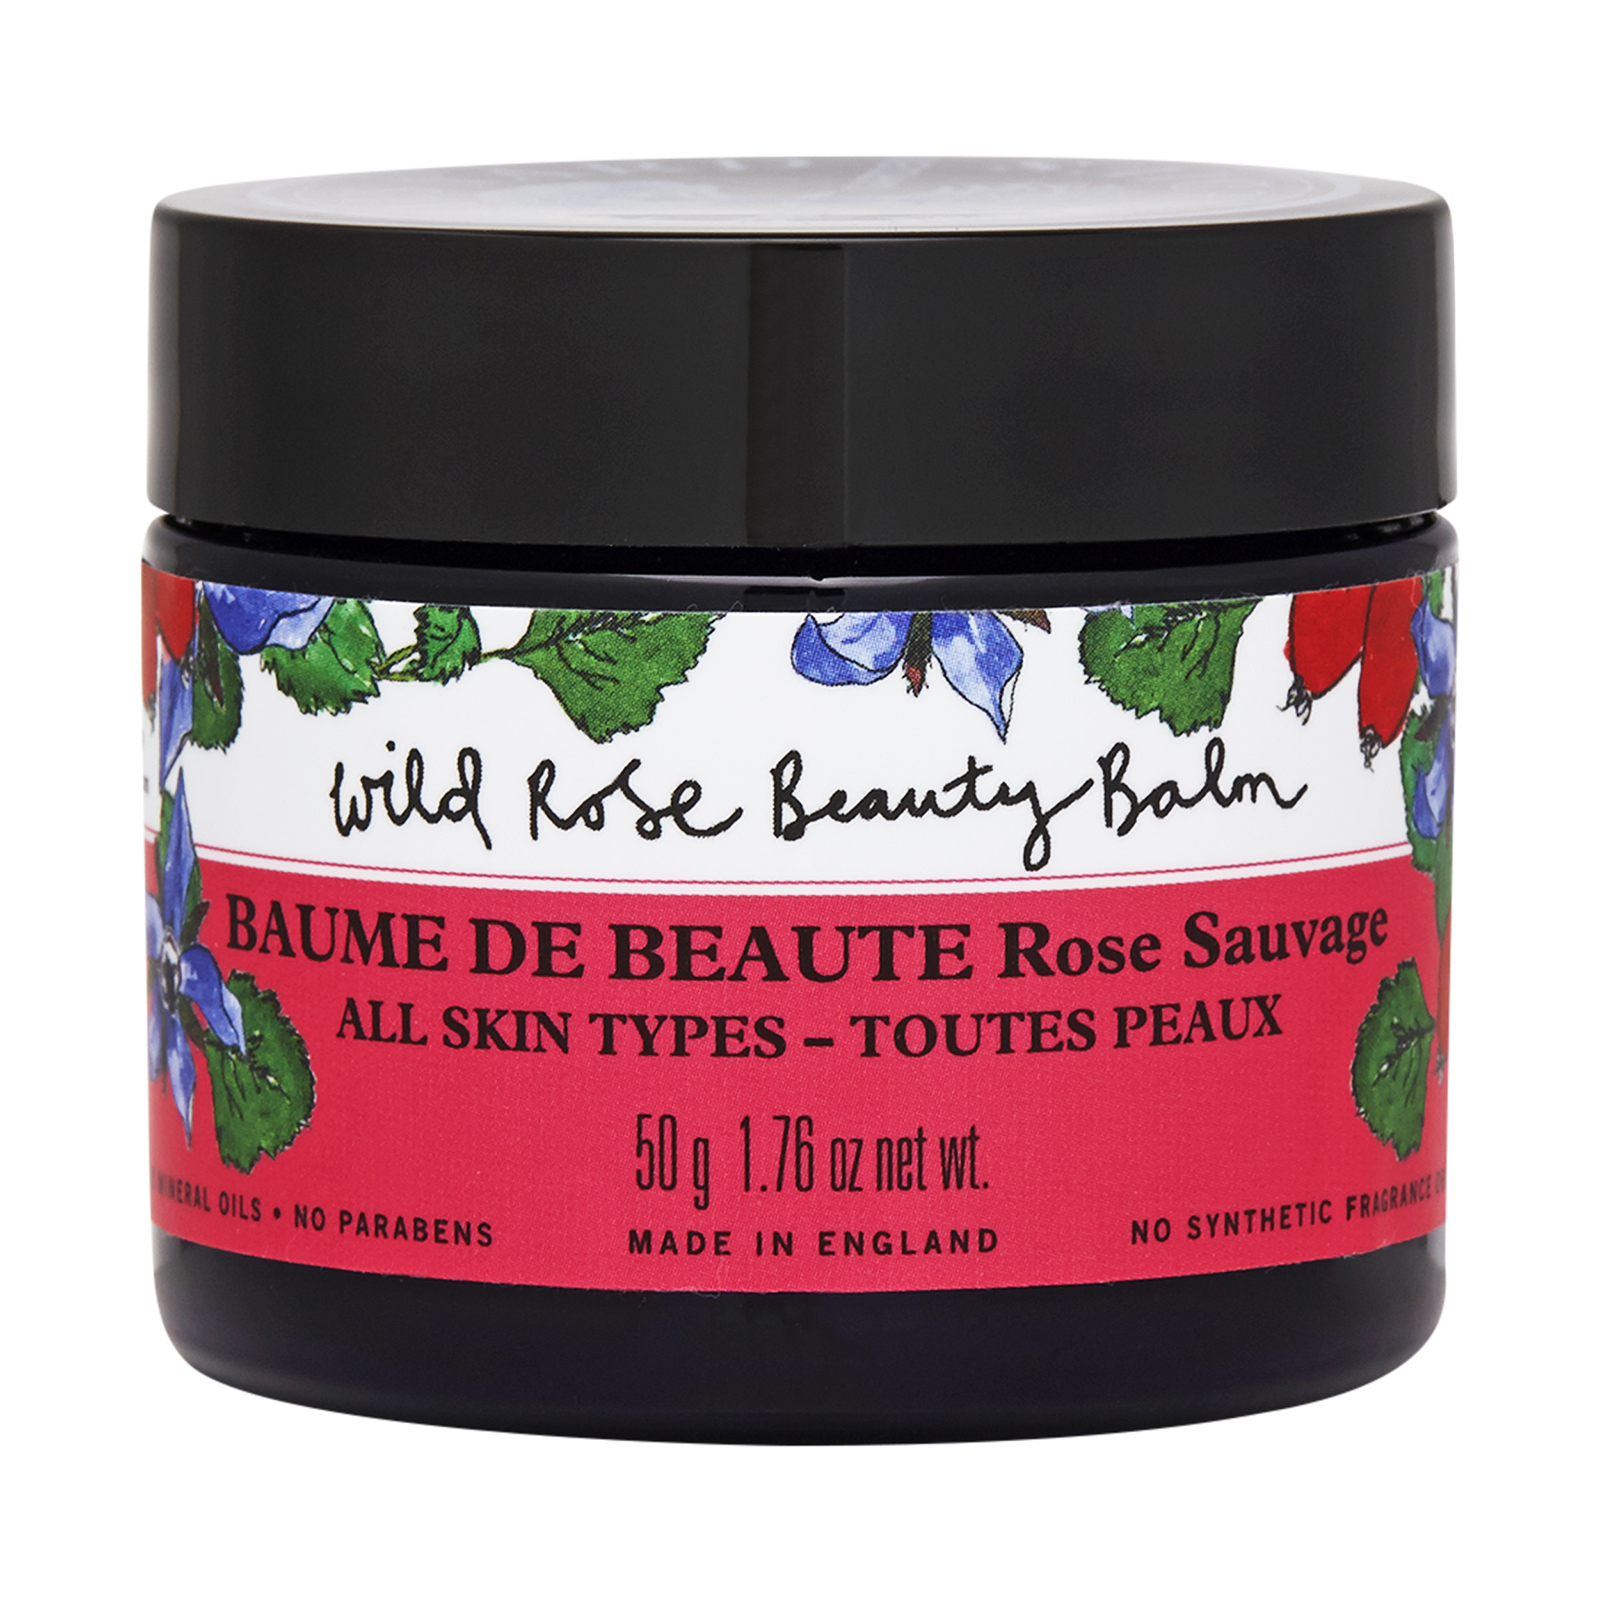 Neal's Yard Remedies Wild Rose Beauty Balm 1.76oz, 50g